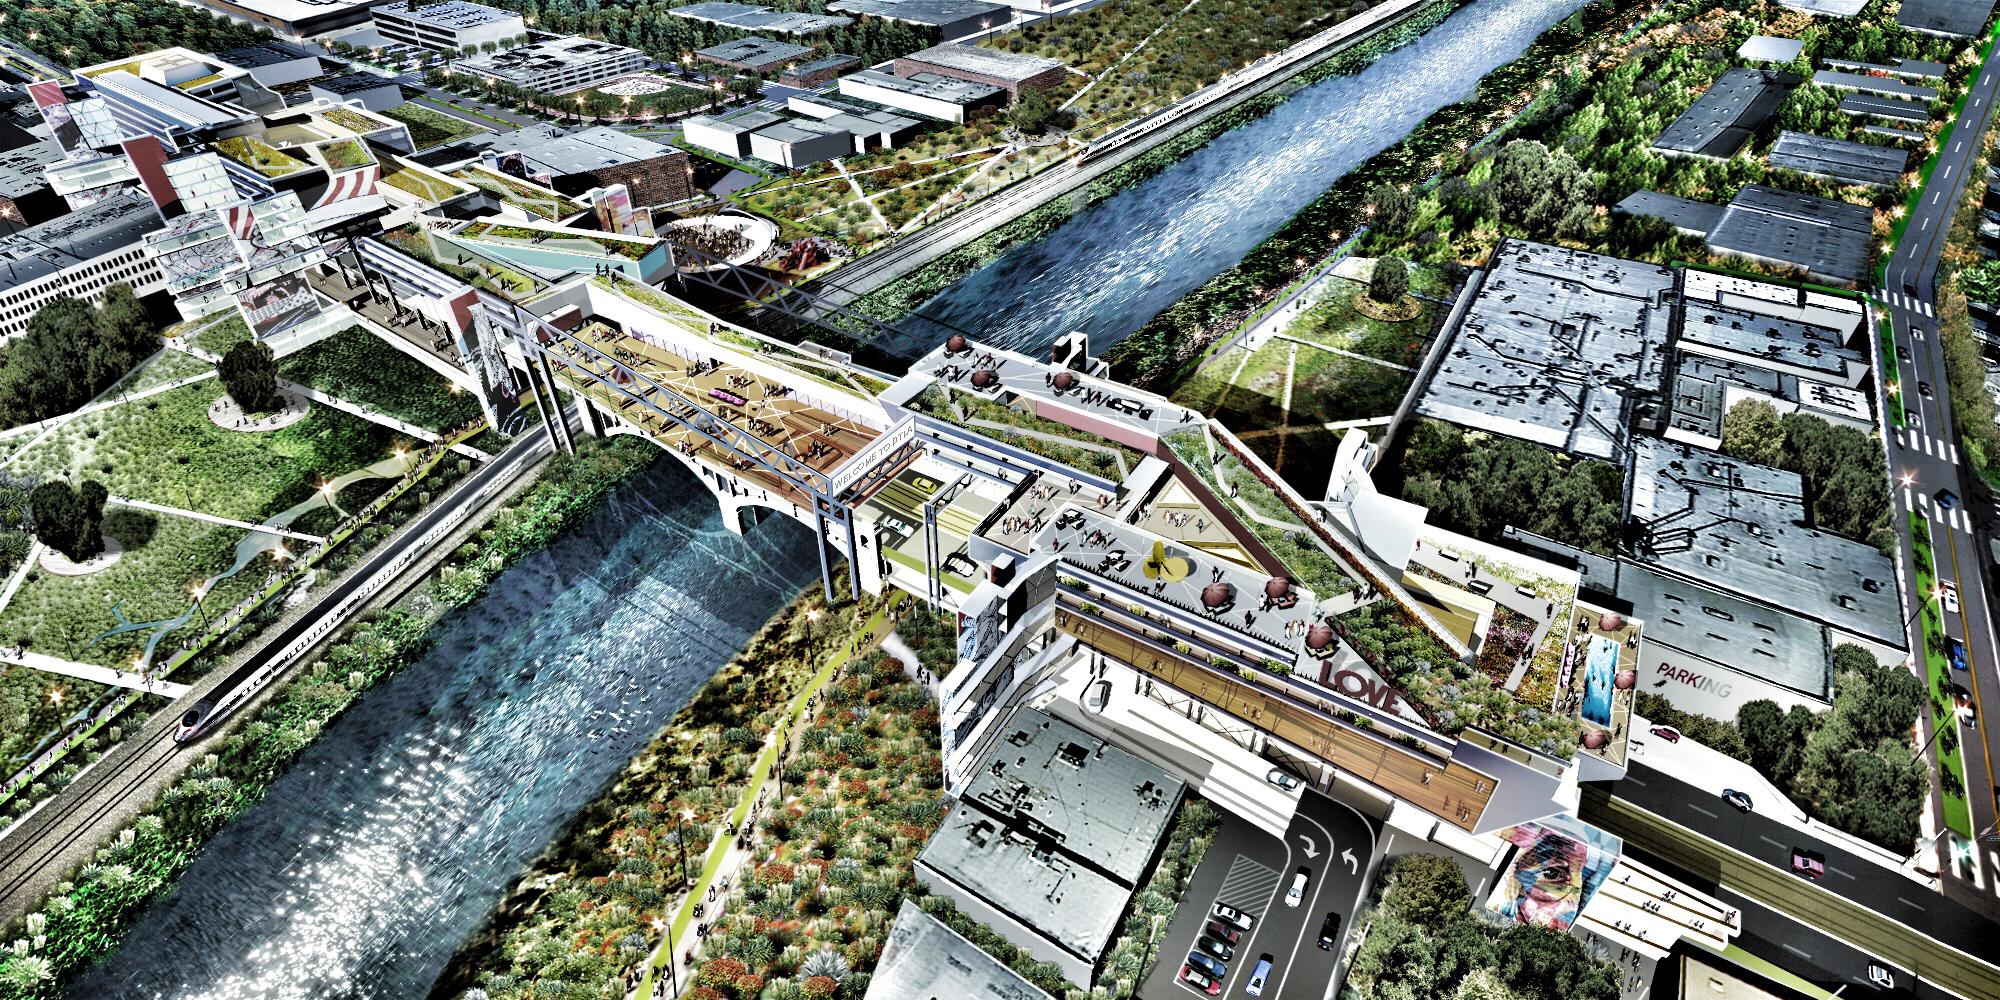 02-Aerial_Far_View-LA_River_Habitable_Bridge.jpg